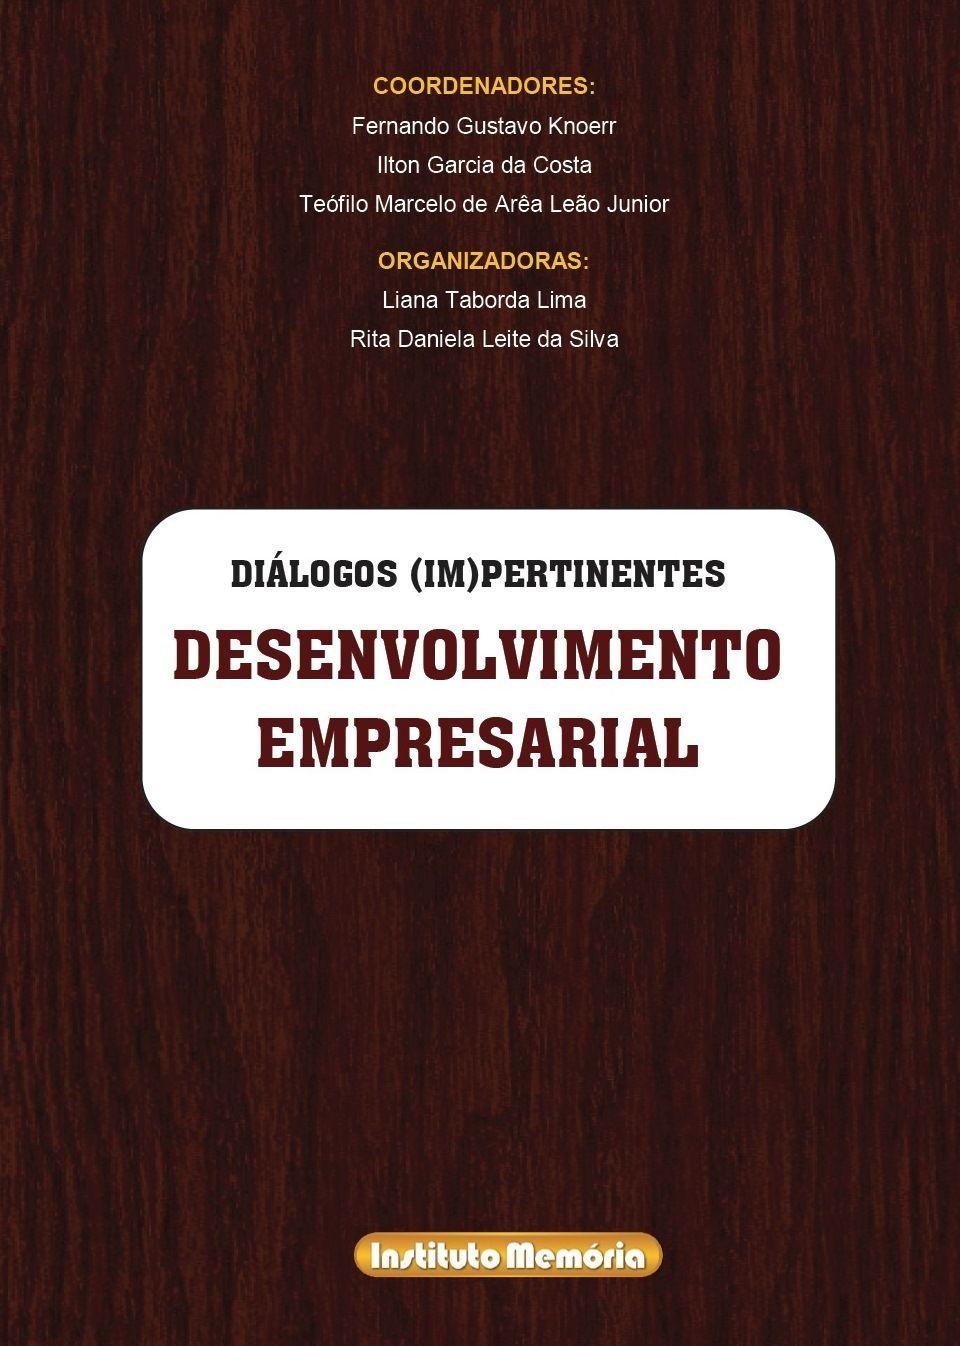 Diálogos (Im)pertinentes - DESENVOLVIMENTO EMPRESARIAL